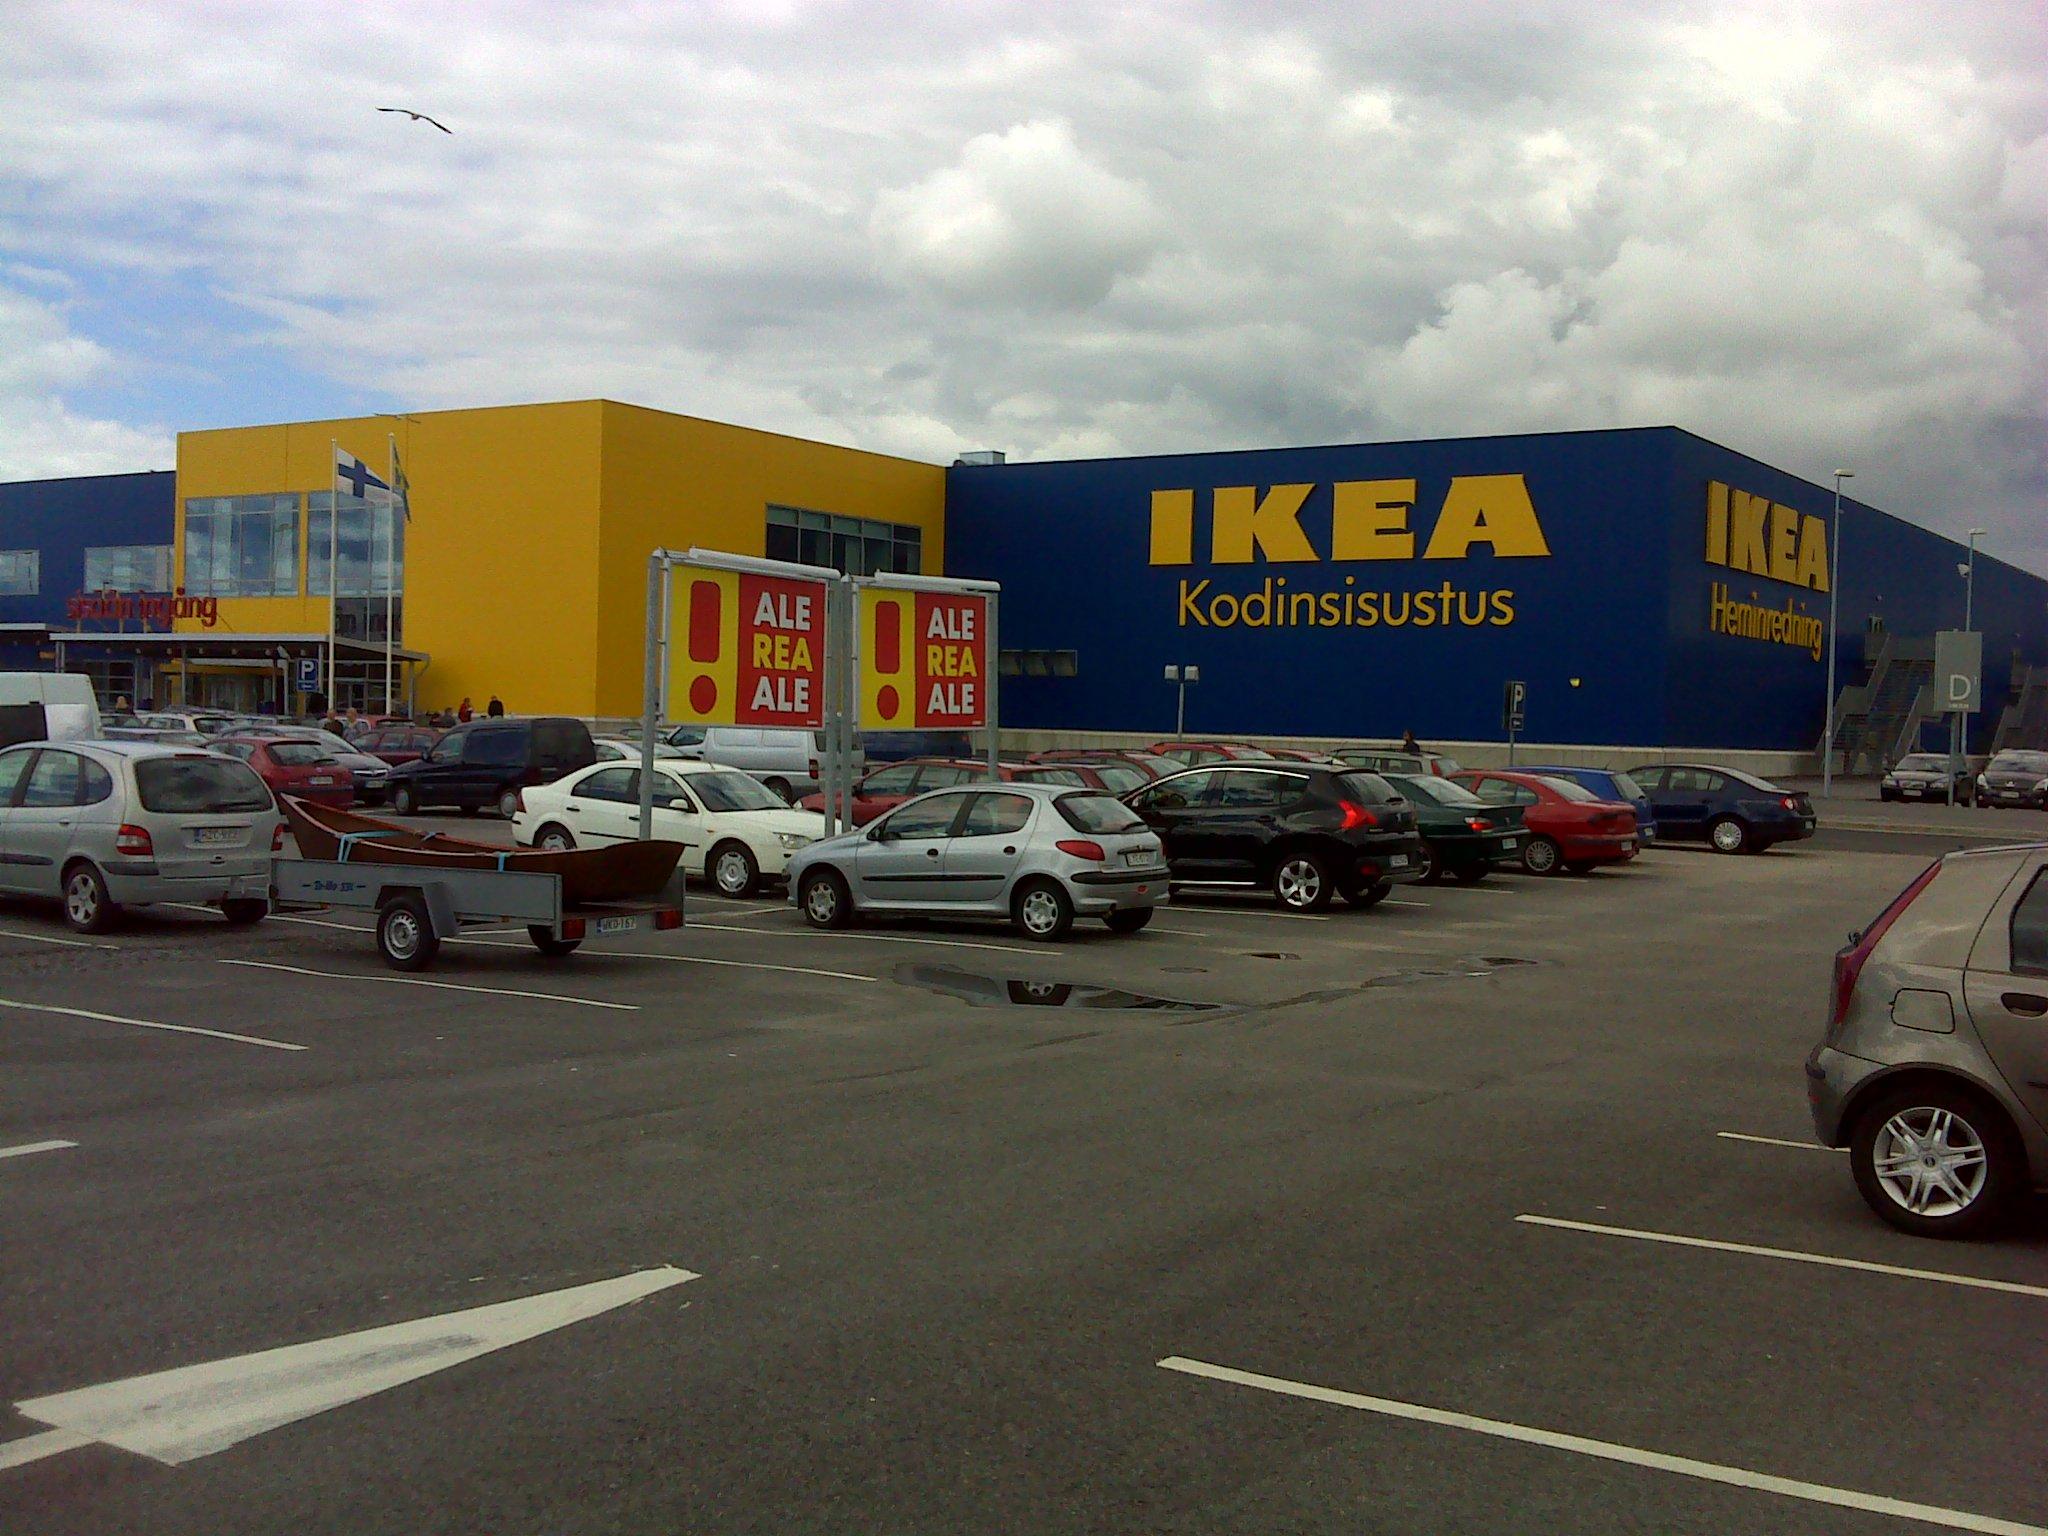 IKEA Raisio - Finland Image